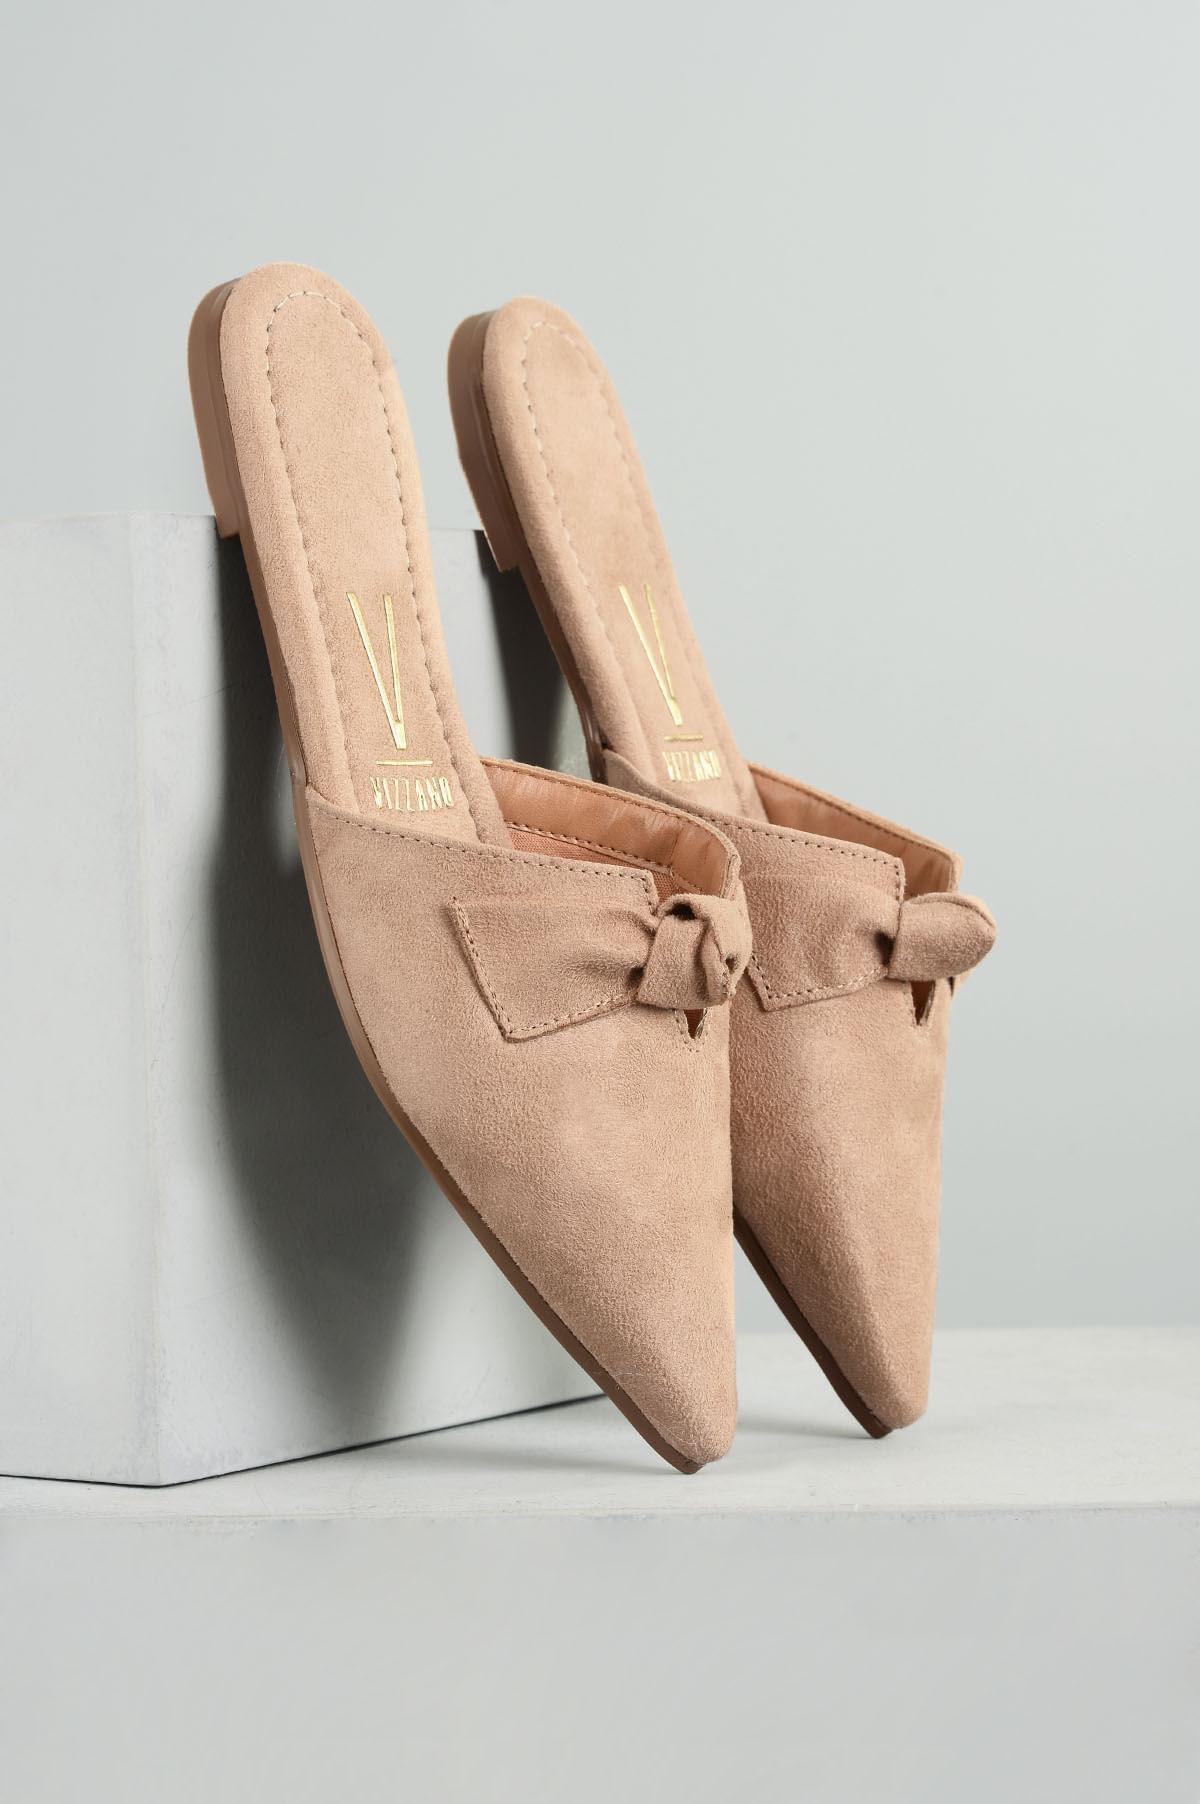 56720c7e6 Mule Feminino Cindy Vizzano CAM - BEGE - Mundial Calçados